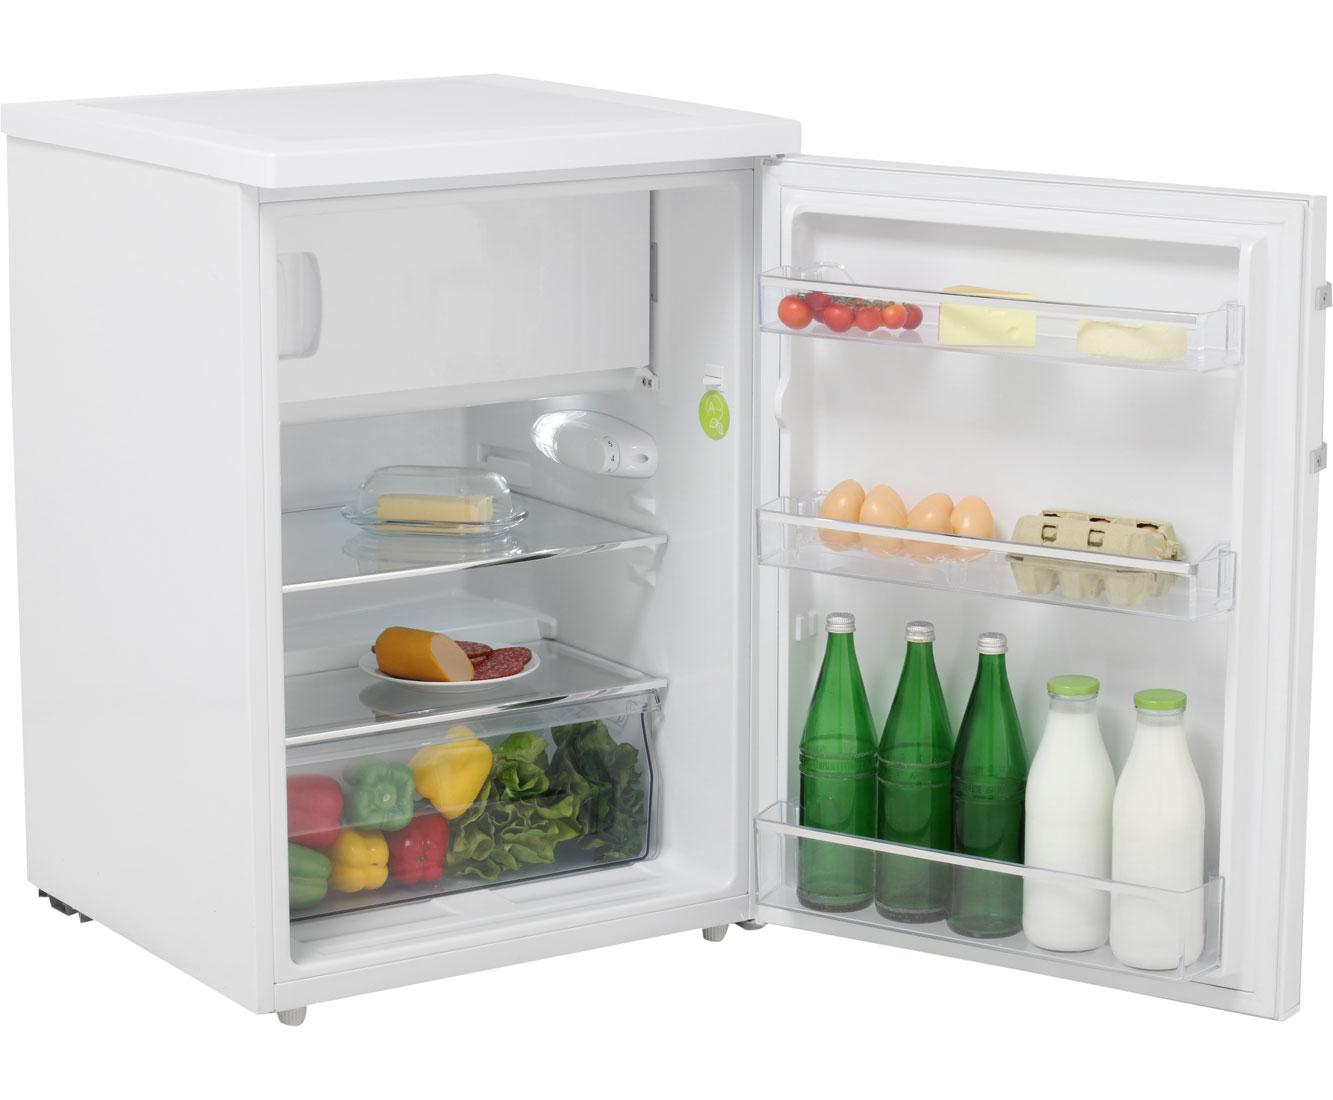 Amica Kühlschrank Weiß : Kühlschrank mit gefrierfach amica ks w weiß: amica ks 15195 w